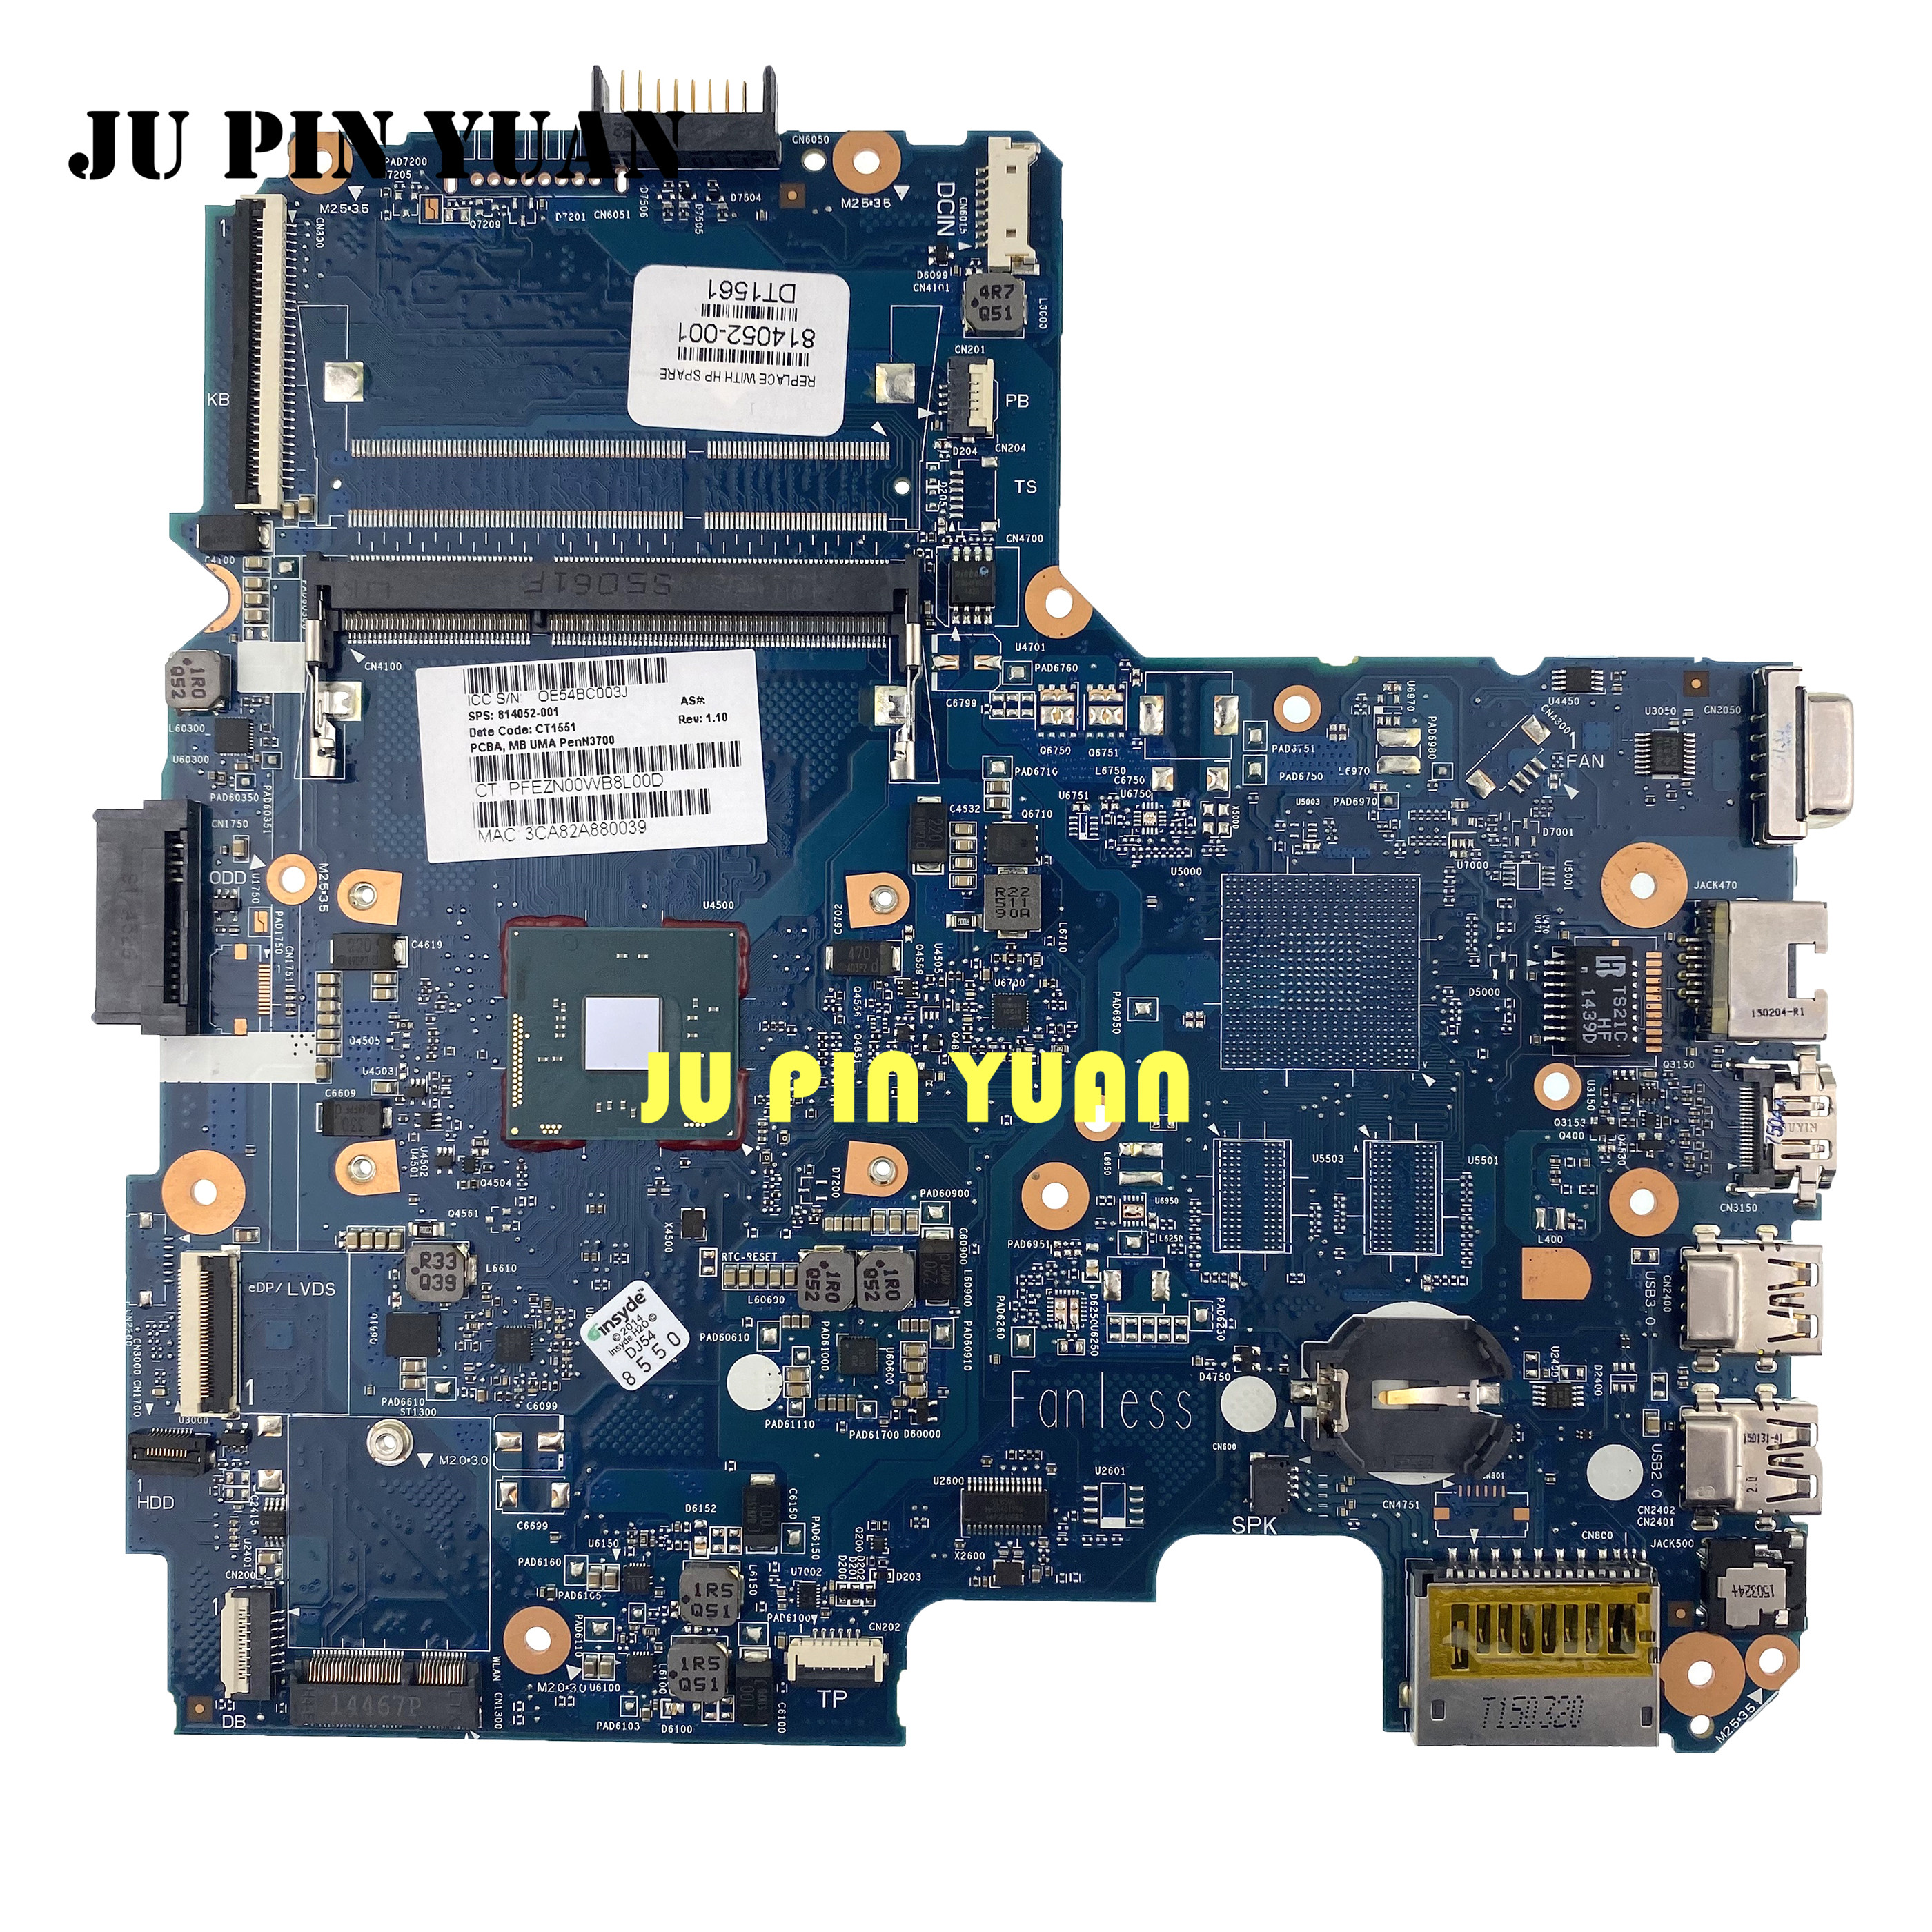 Sparepart: OKI Main PCB Board Europe MB290 253126147